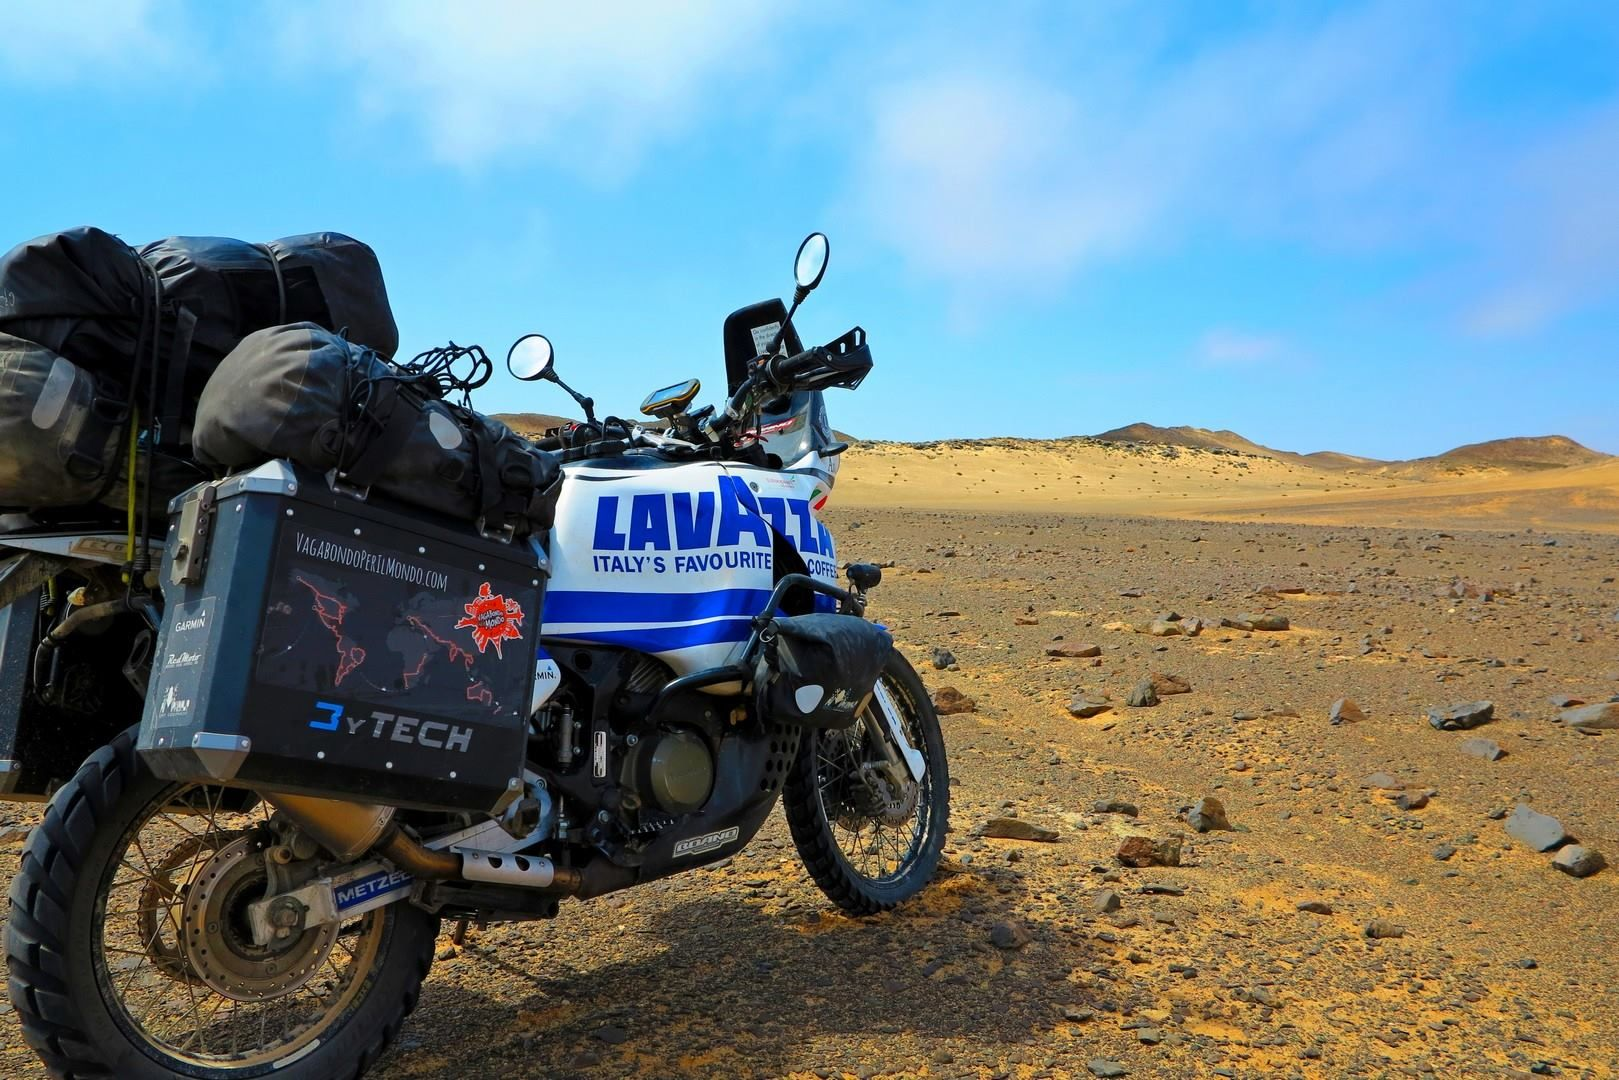 #Namibia #adventure